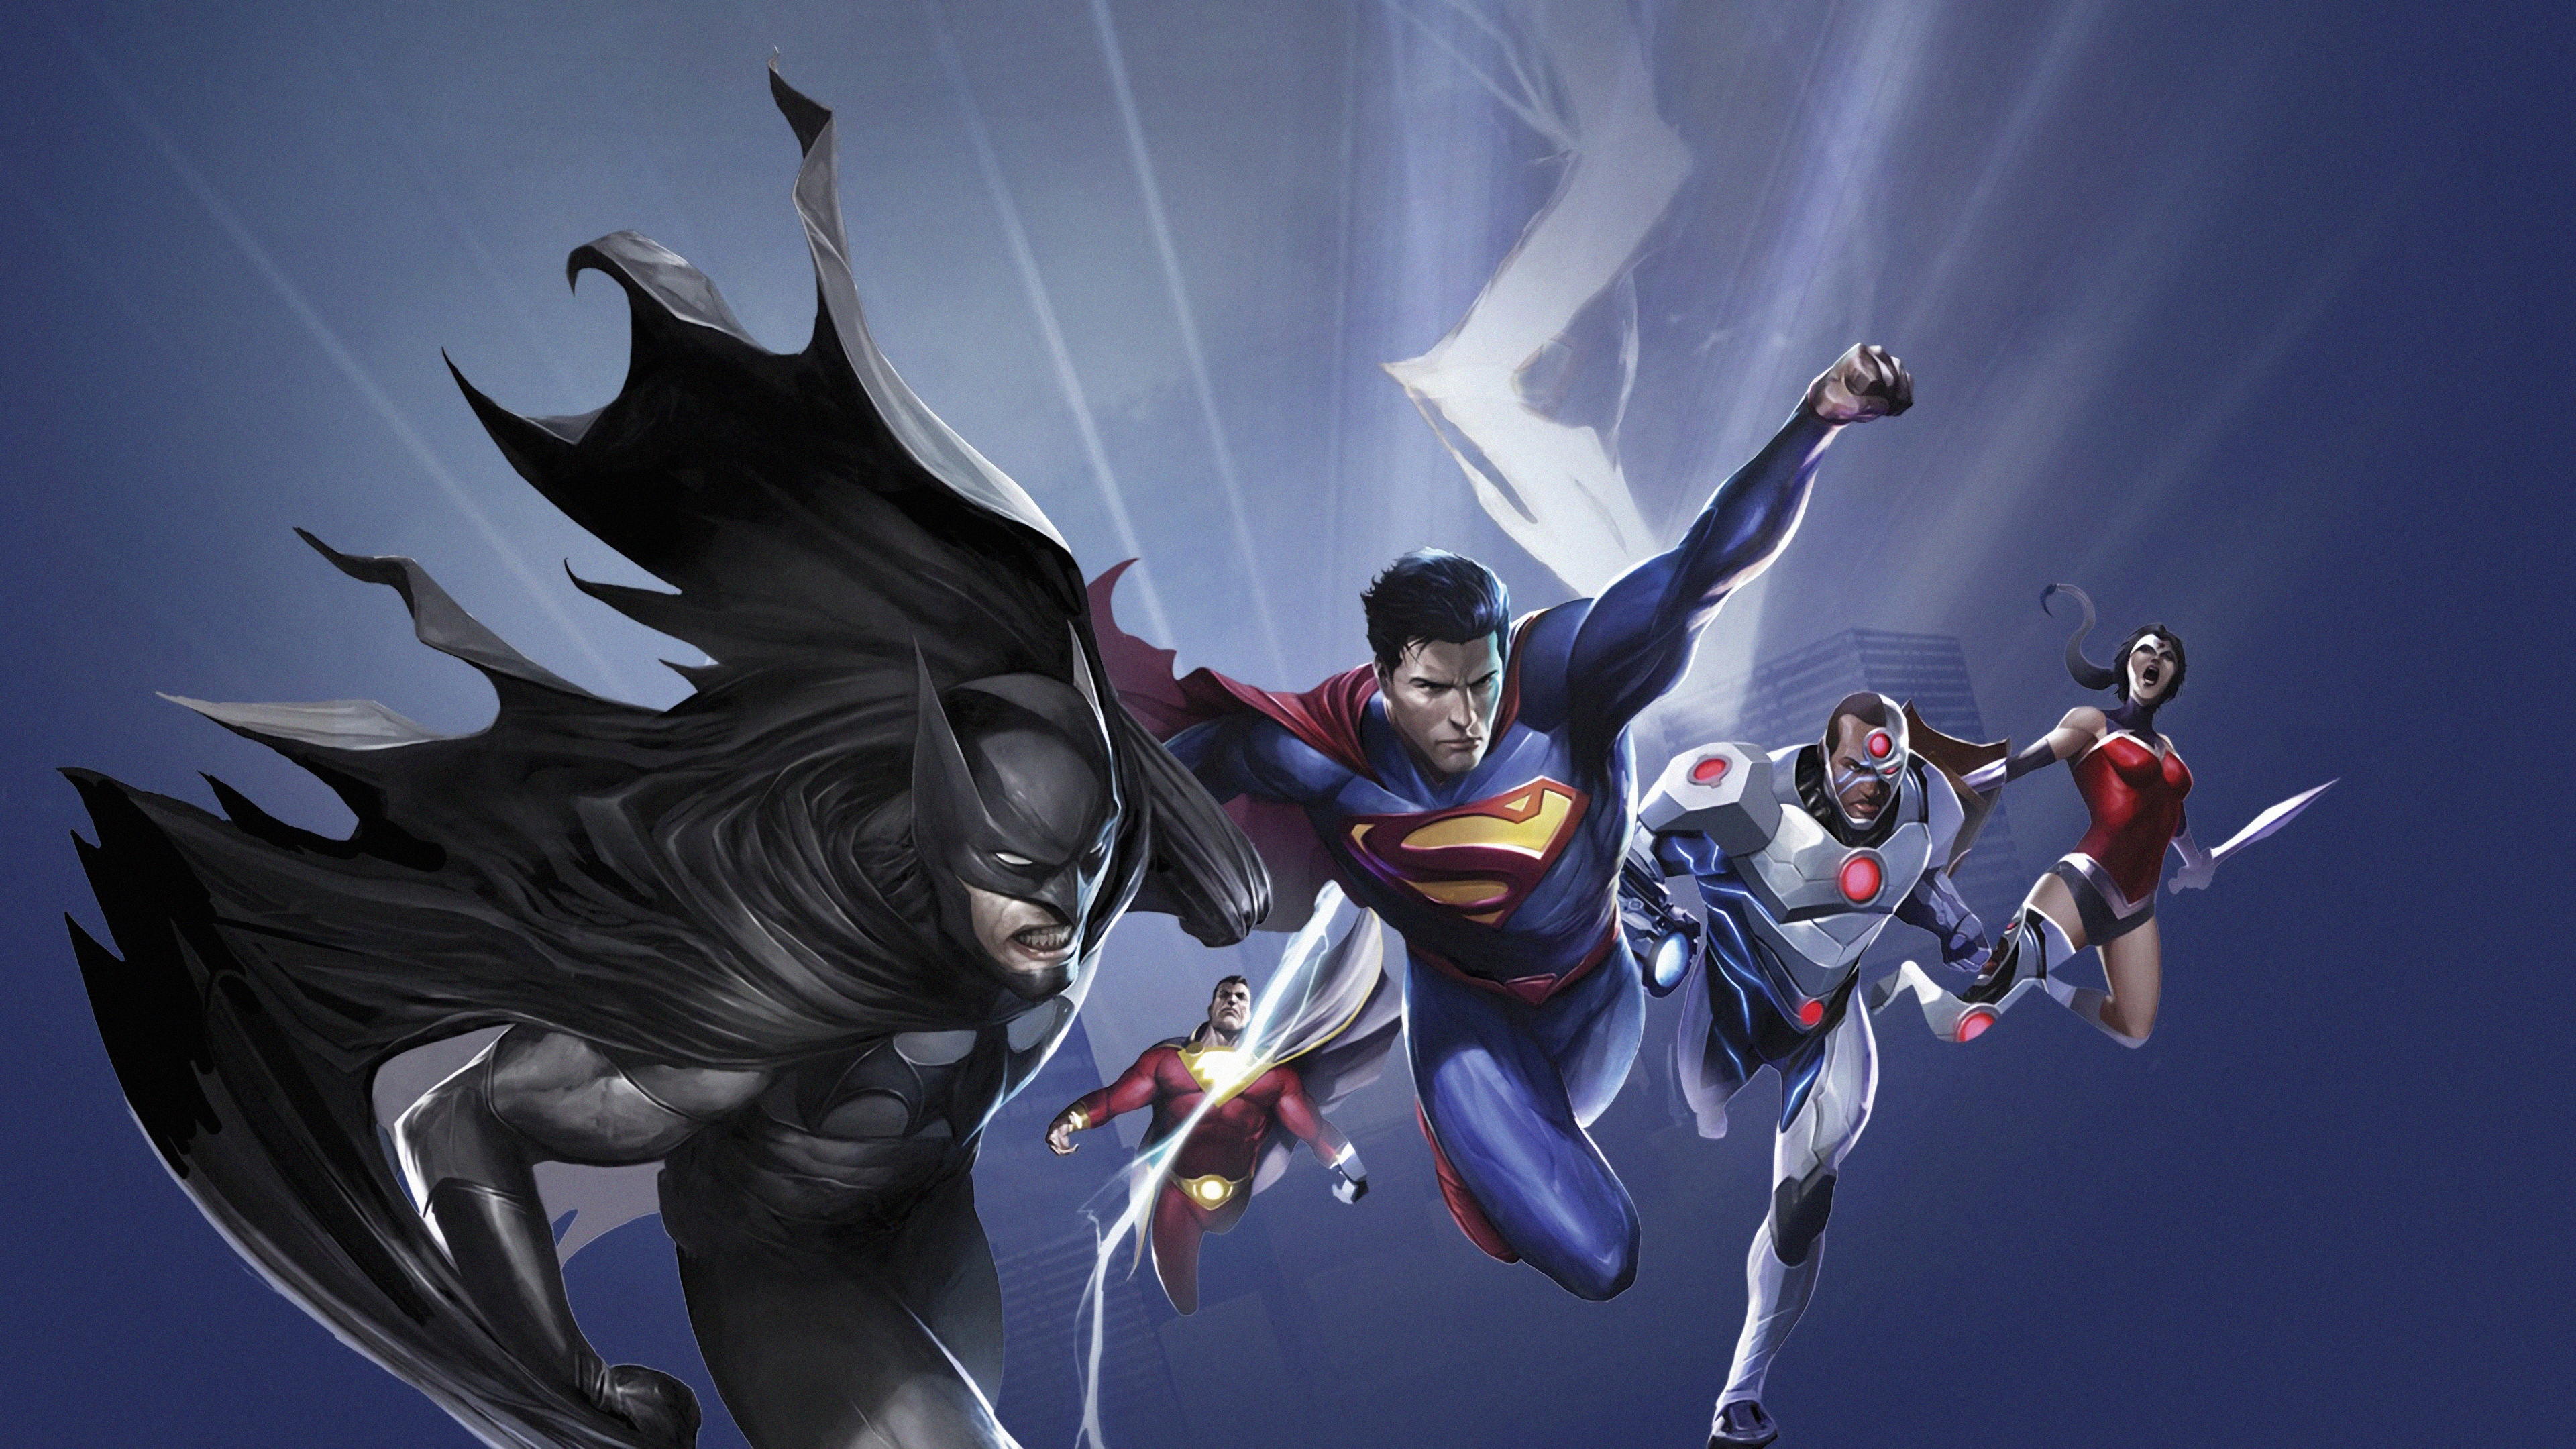 Wallpaper 4k Justice League War 4k Wallpapers Batman